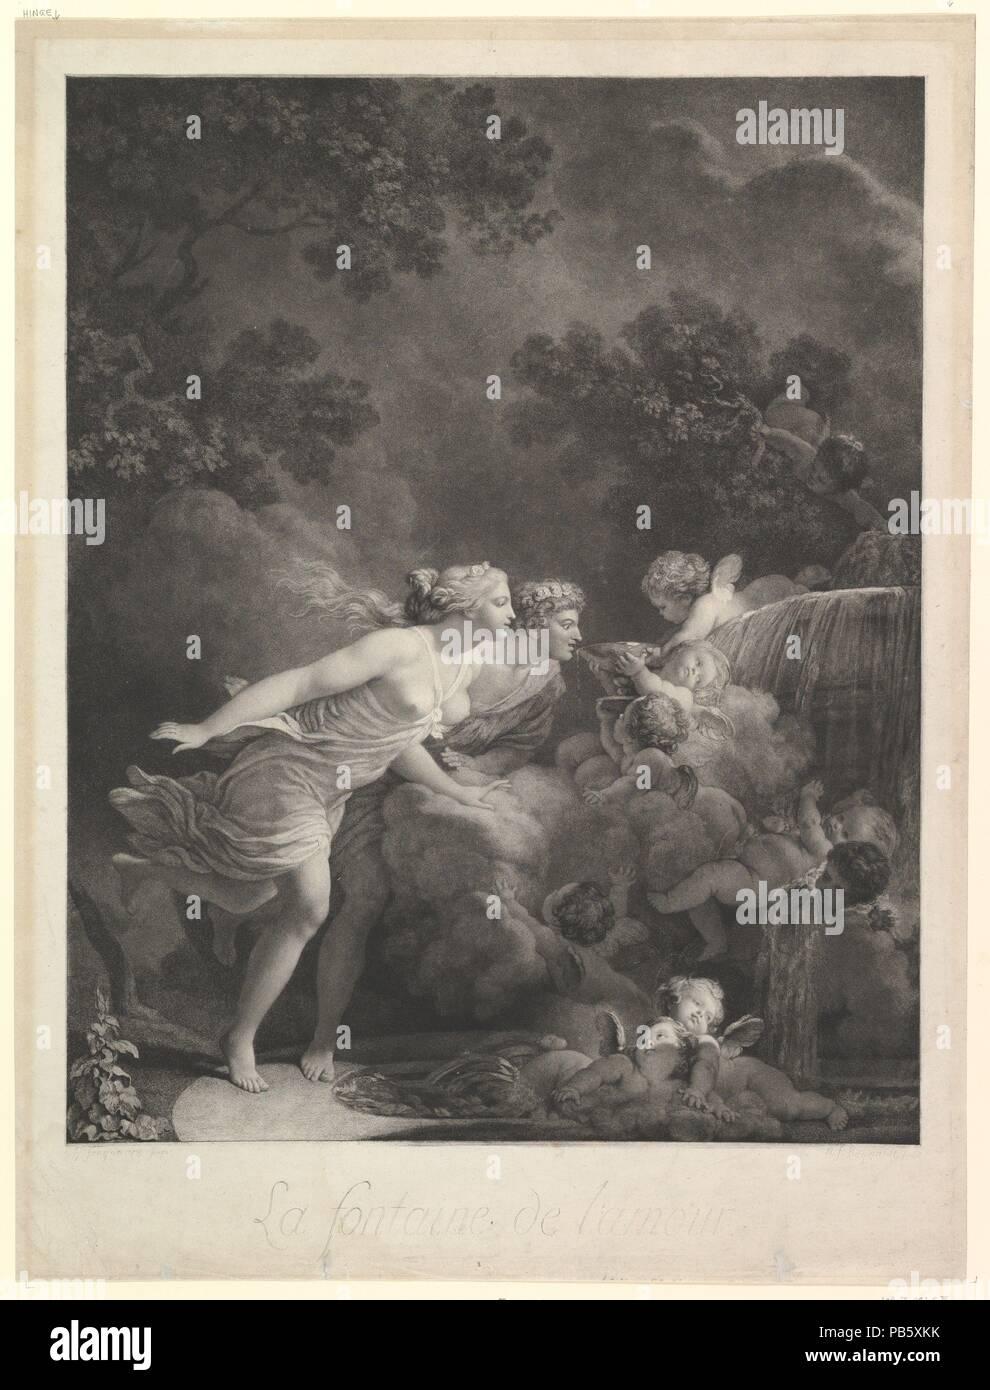 La Fontaine d'Amour. Artist: After Jean Honoré Fragonard (French, Grasse 1732-1806 Paris). Dimensions: sheet: 24 15/16 x 19 in. (63.4 x 48.3 cm)  image: 23 7/16 x 16 15/16 in. (59.5 x 43.1 cm). Engraver: Engraved by Nicholas François Regnault (French, Paris 1746-1810). Date: 1785. Museum: Metropolitan Museum of Art, New York, USA. Stock Photo